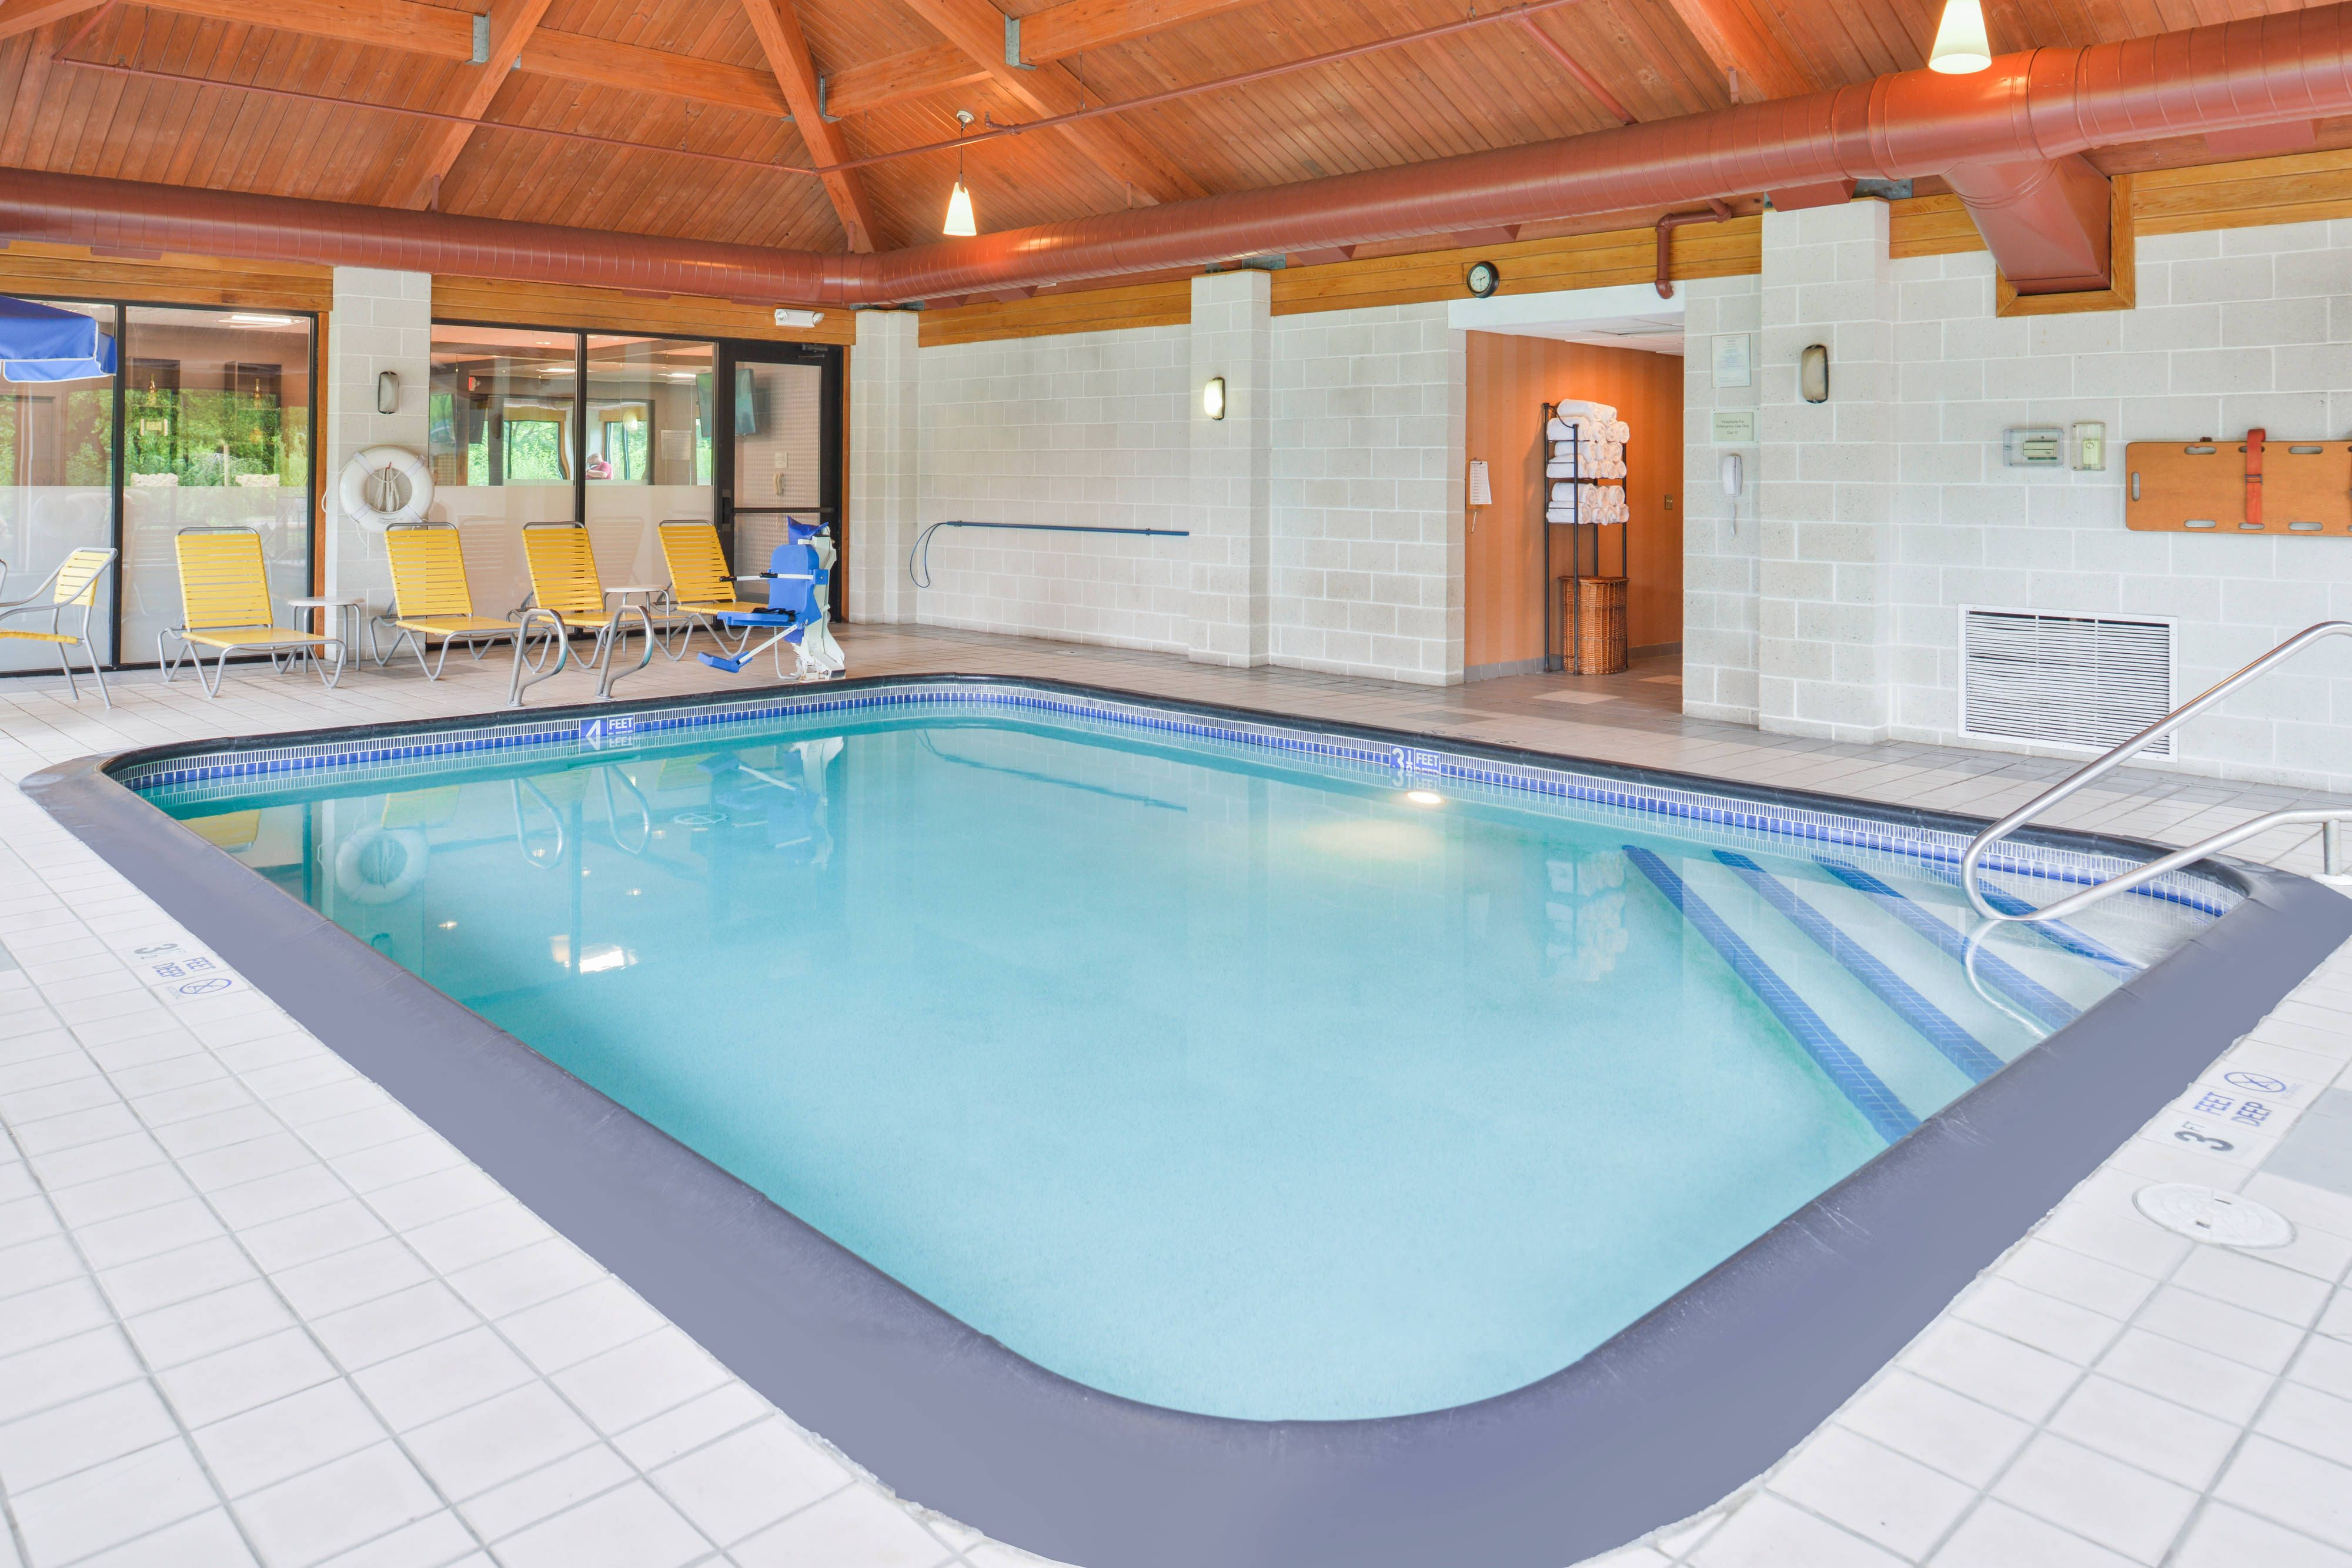 Fairfield Inn Corning Riverside Indoor Pool comfortable